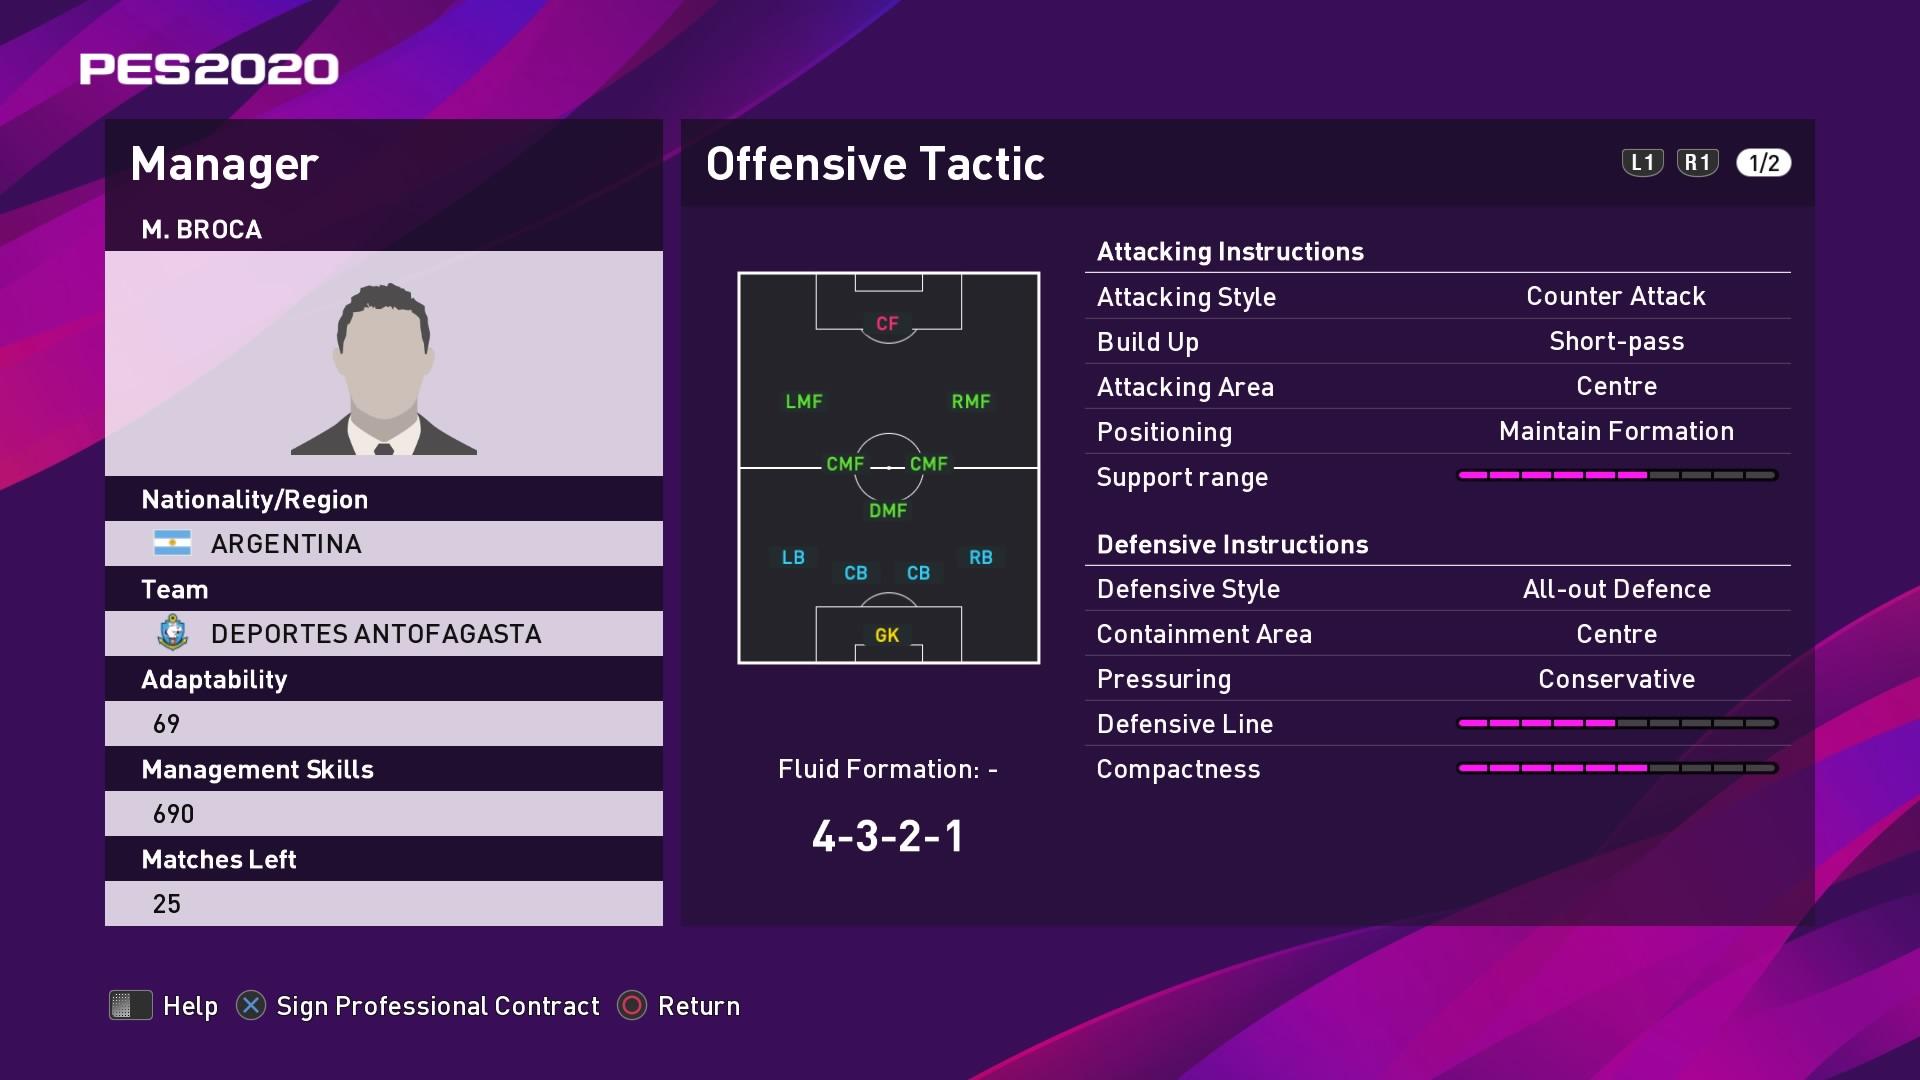 M. Broca (Juan Manuel Azconzábal) Offensive Tactic in PES 2020 myClub